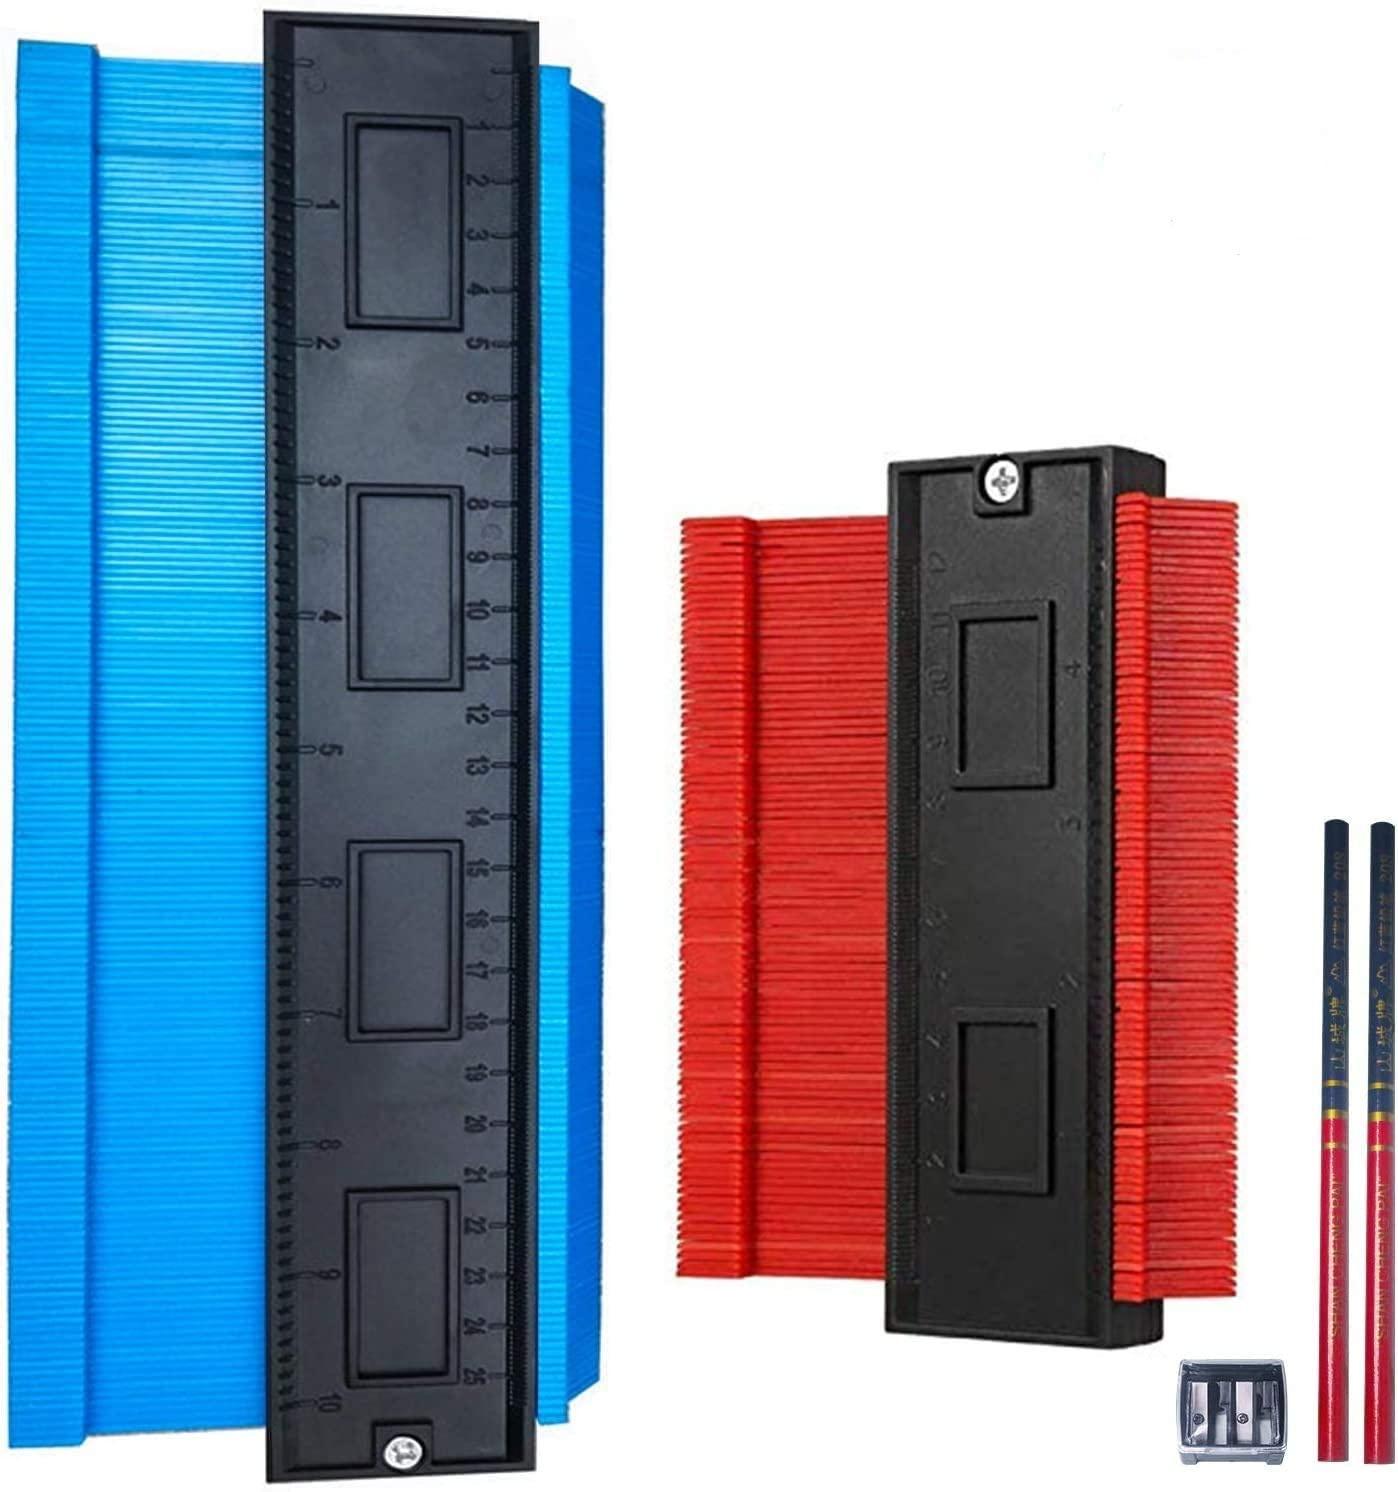 Master Outline Gauge Duplicator - Selkie 5pcs Contour Gauge Tool Kits, 5